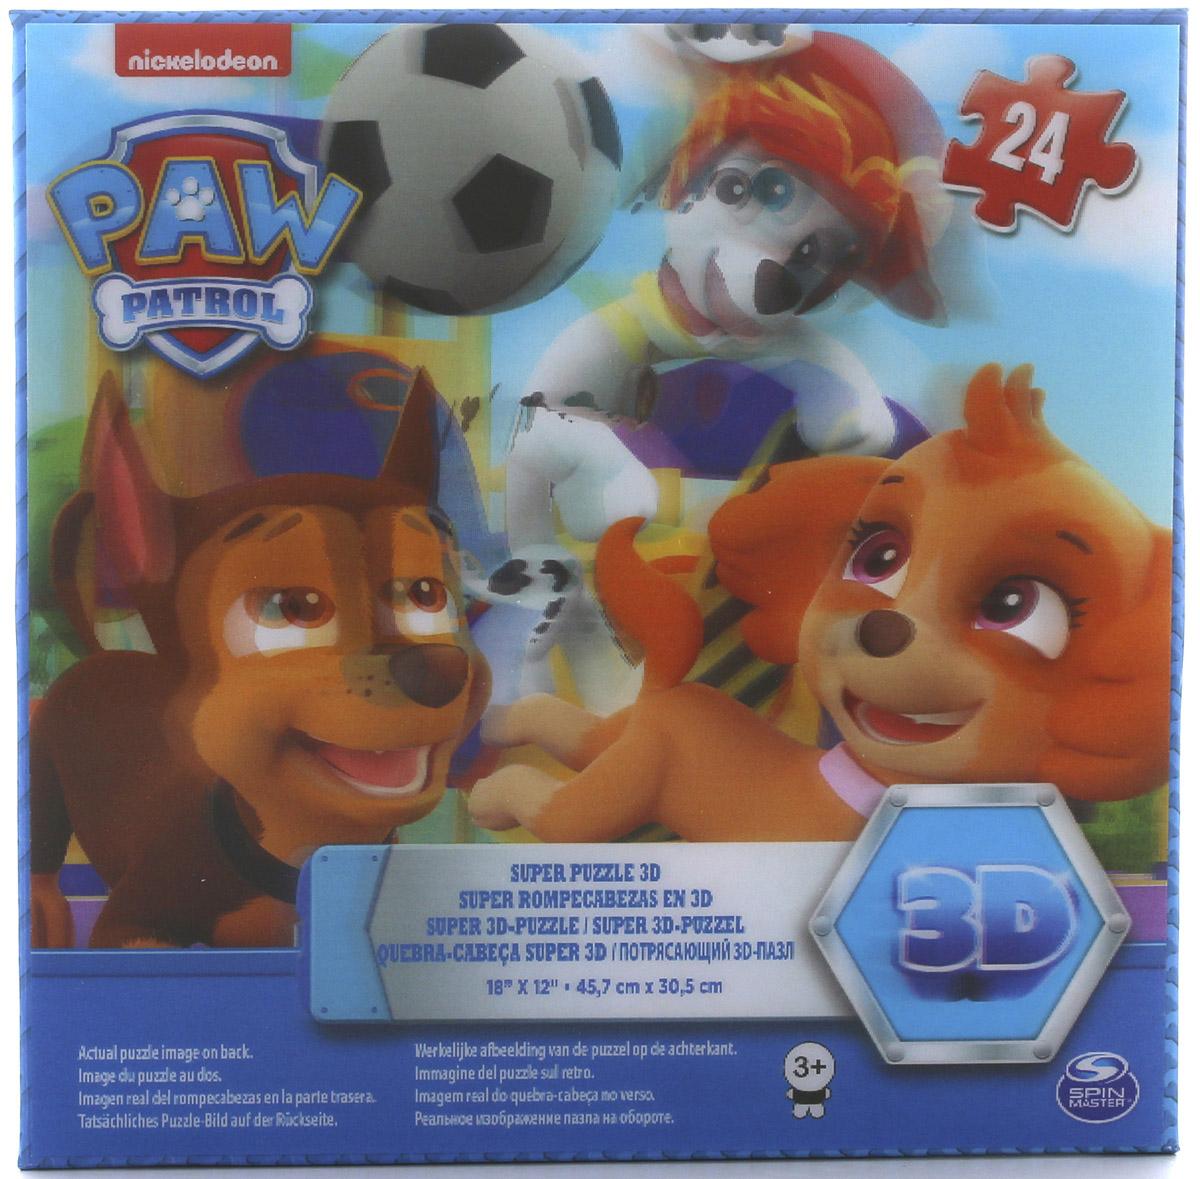 Paw Patrol Супер 3D пазл пазл paw patrol 6028786